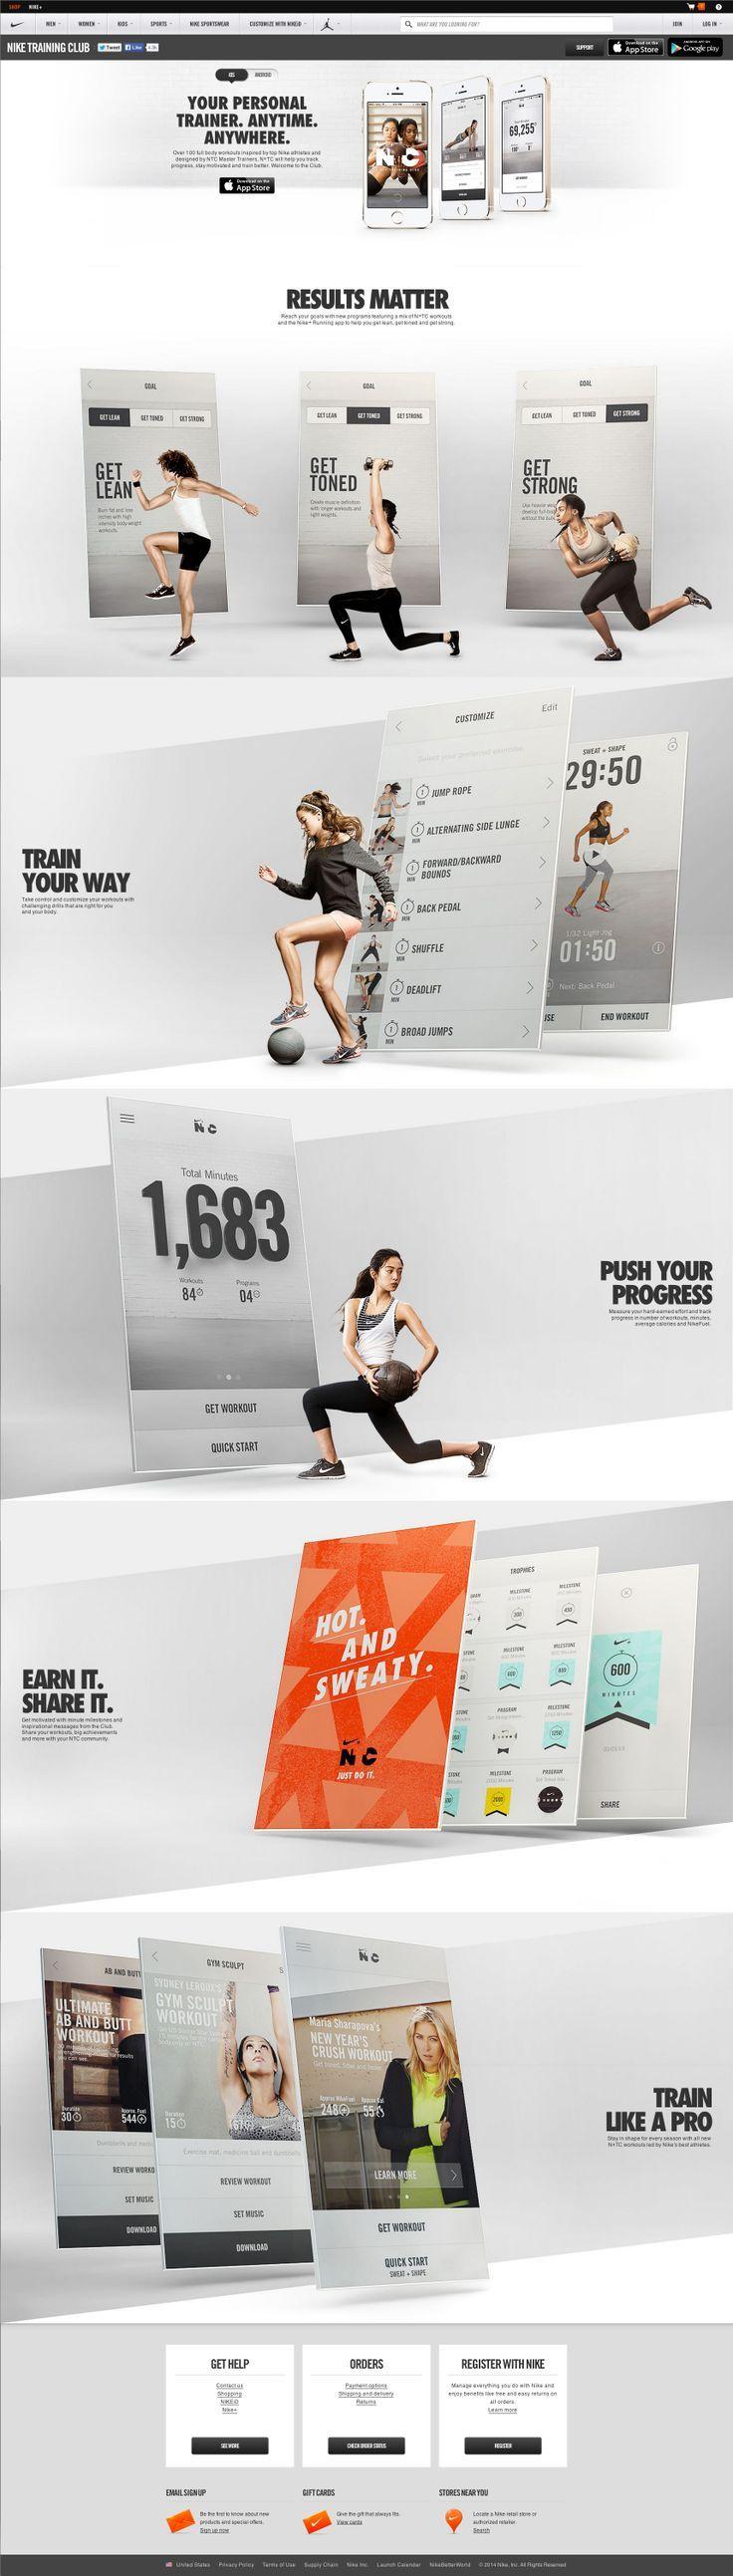 Unique Web Design, Nike Training Club via @gehanjay #WebDesign #Design